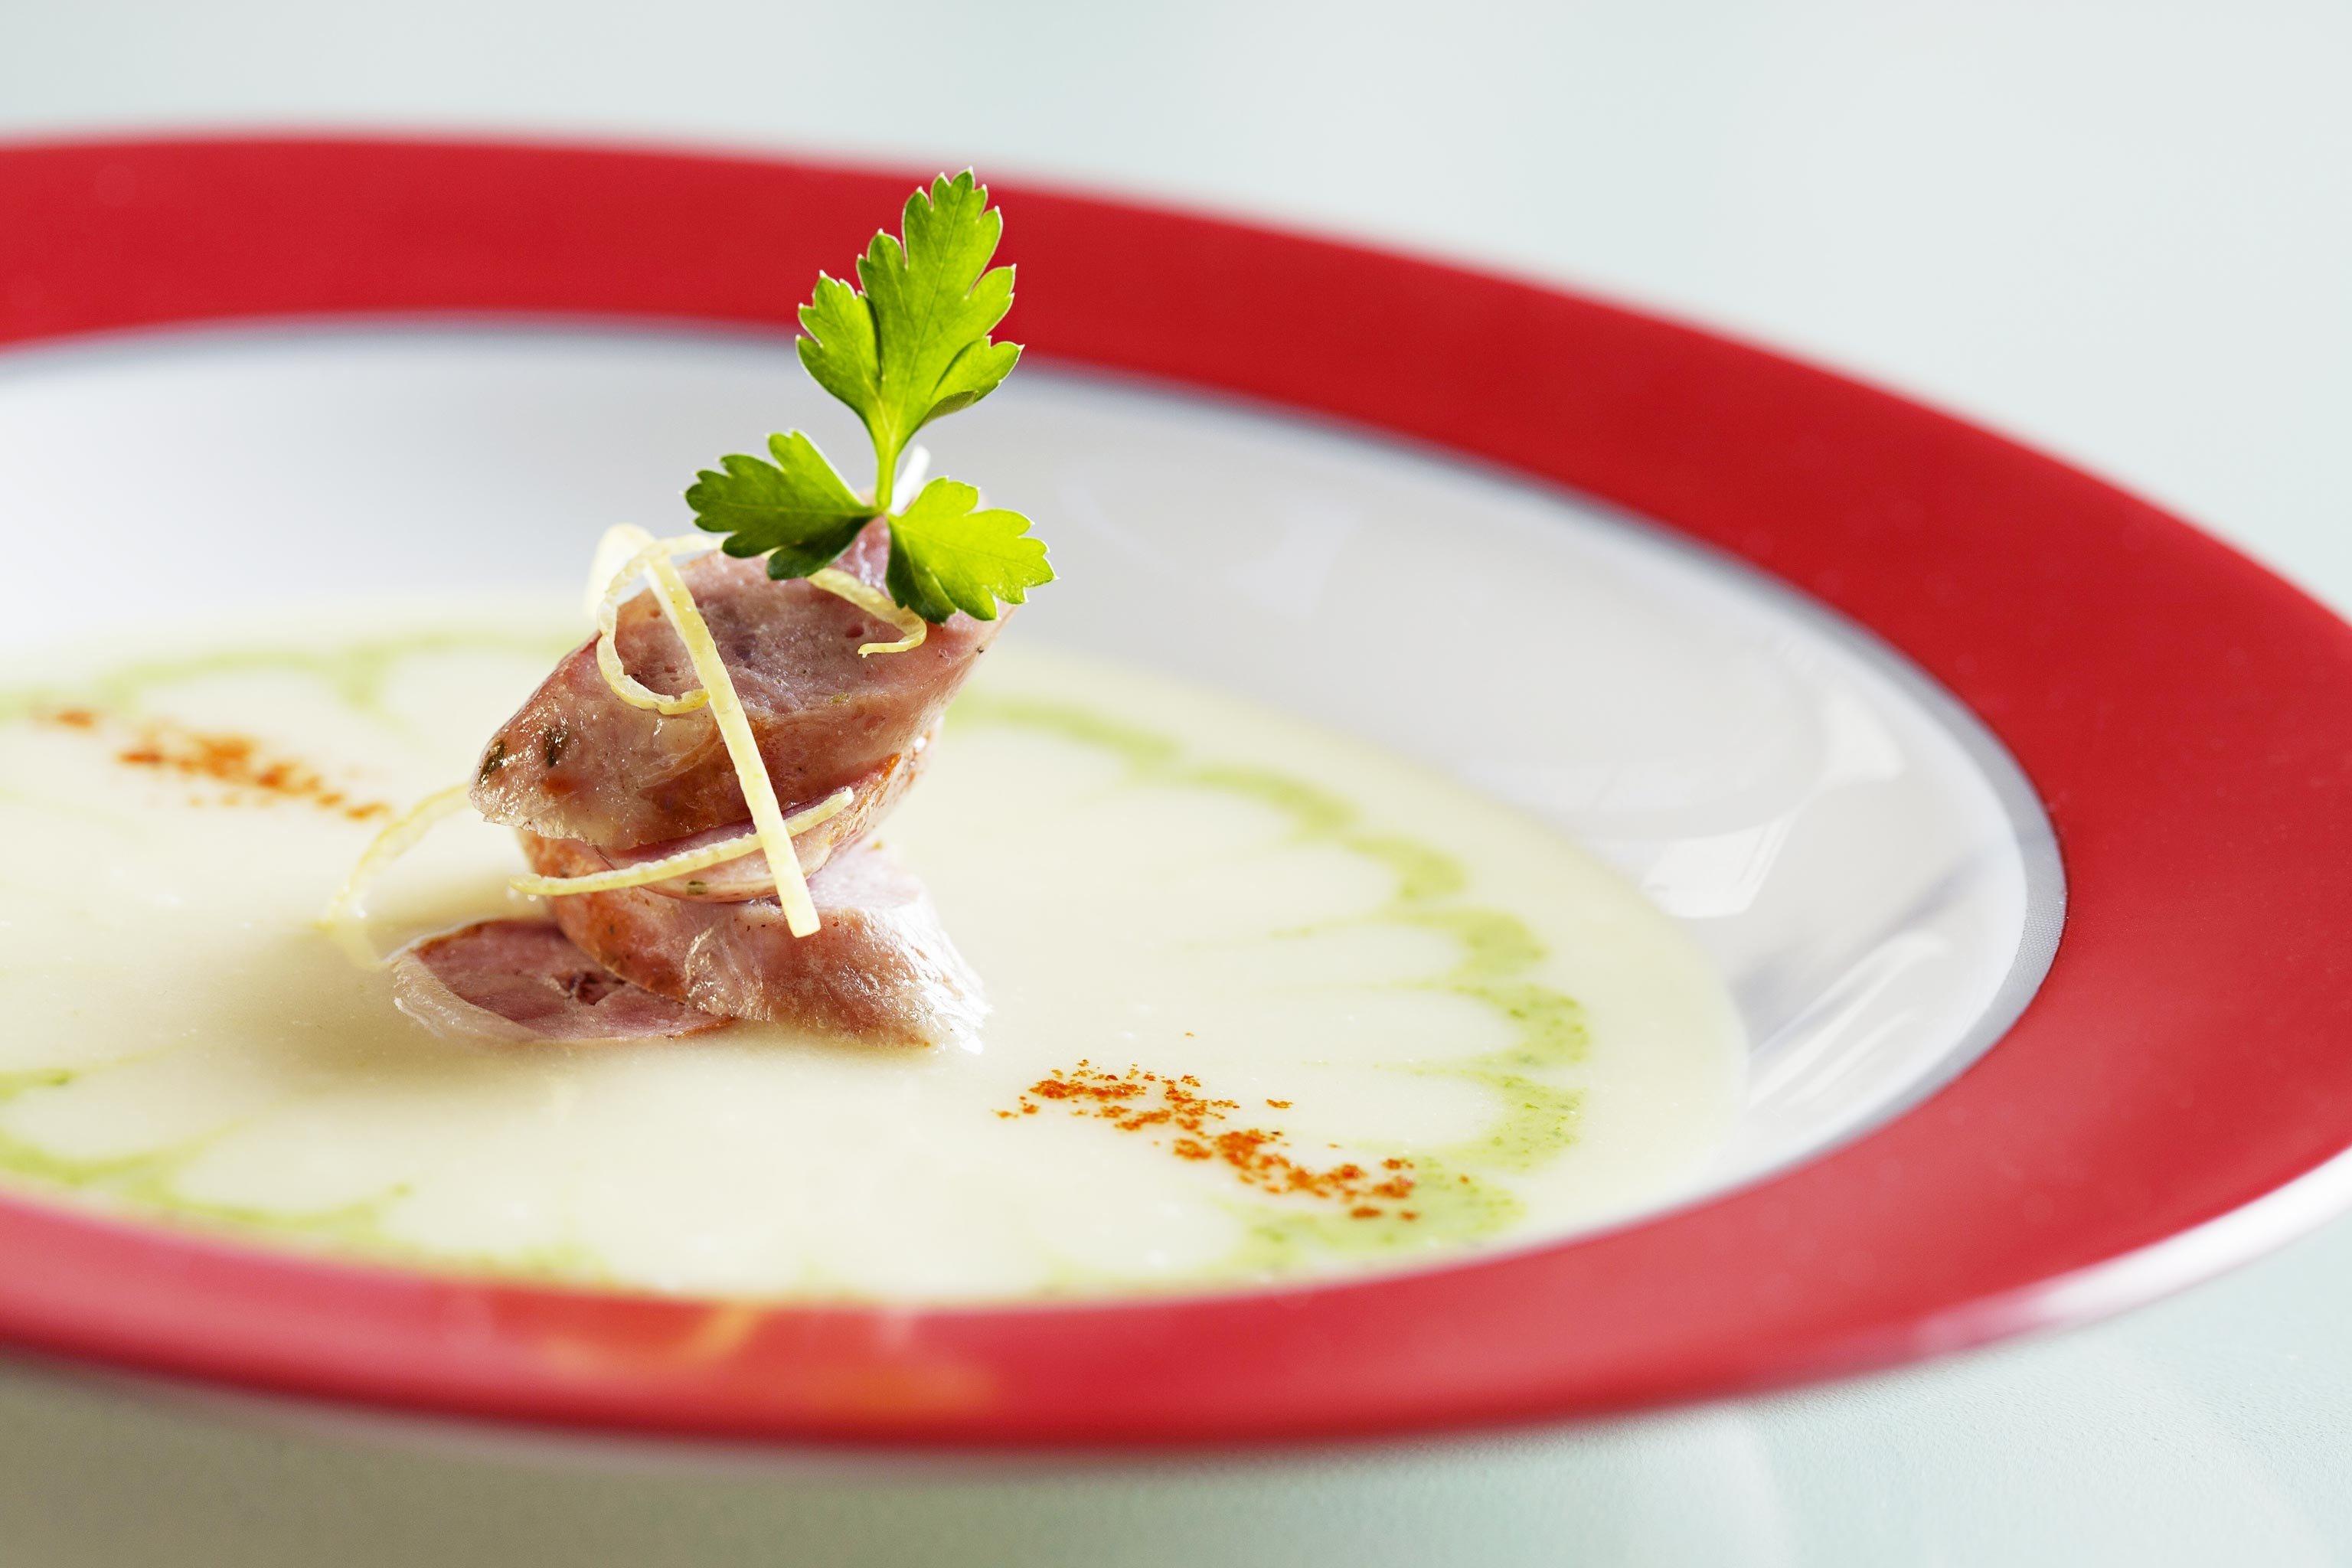 Dining Eat Luxury plate food soup white cuisine meat vegetable piece de resistance